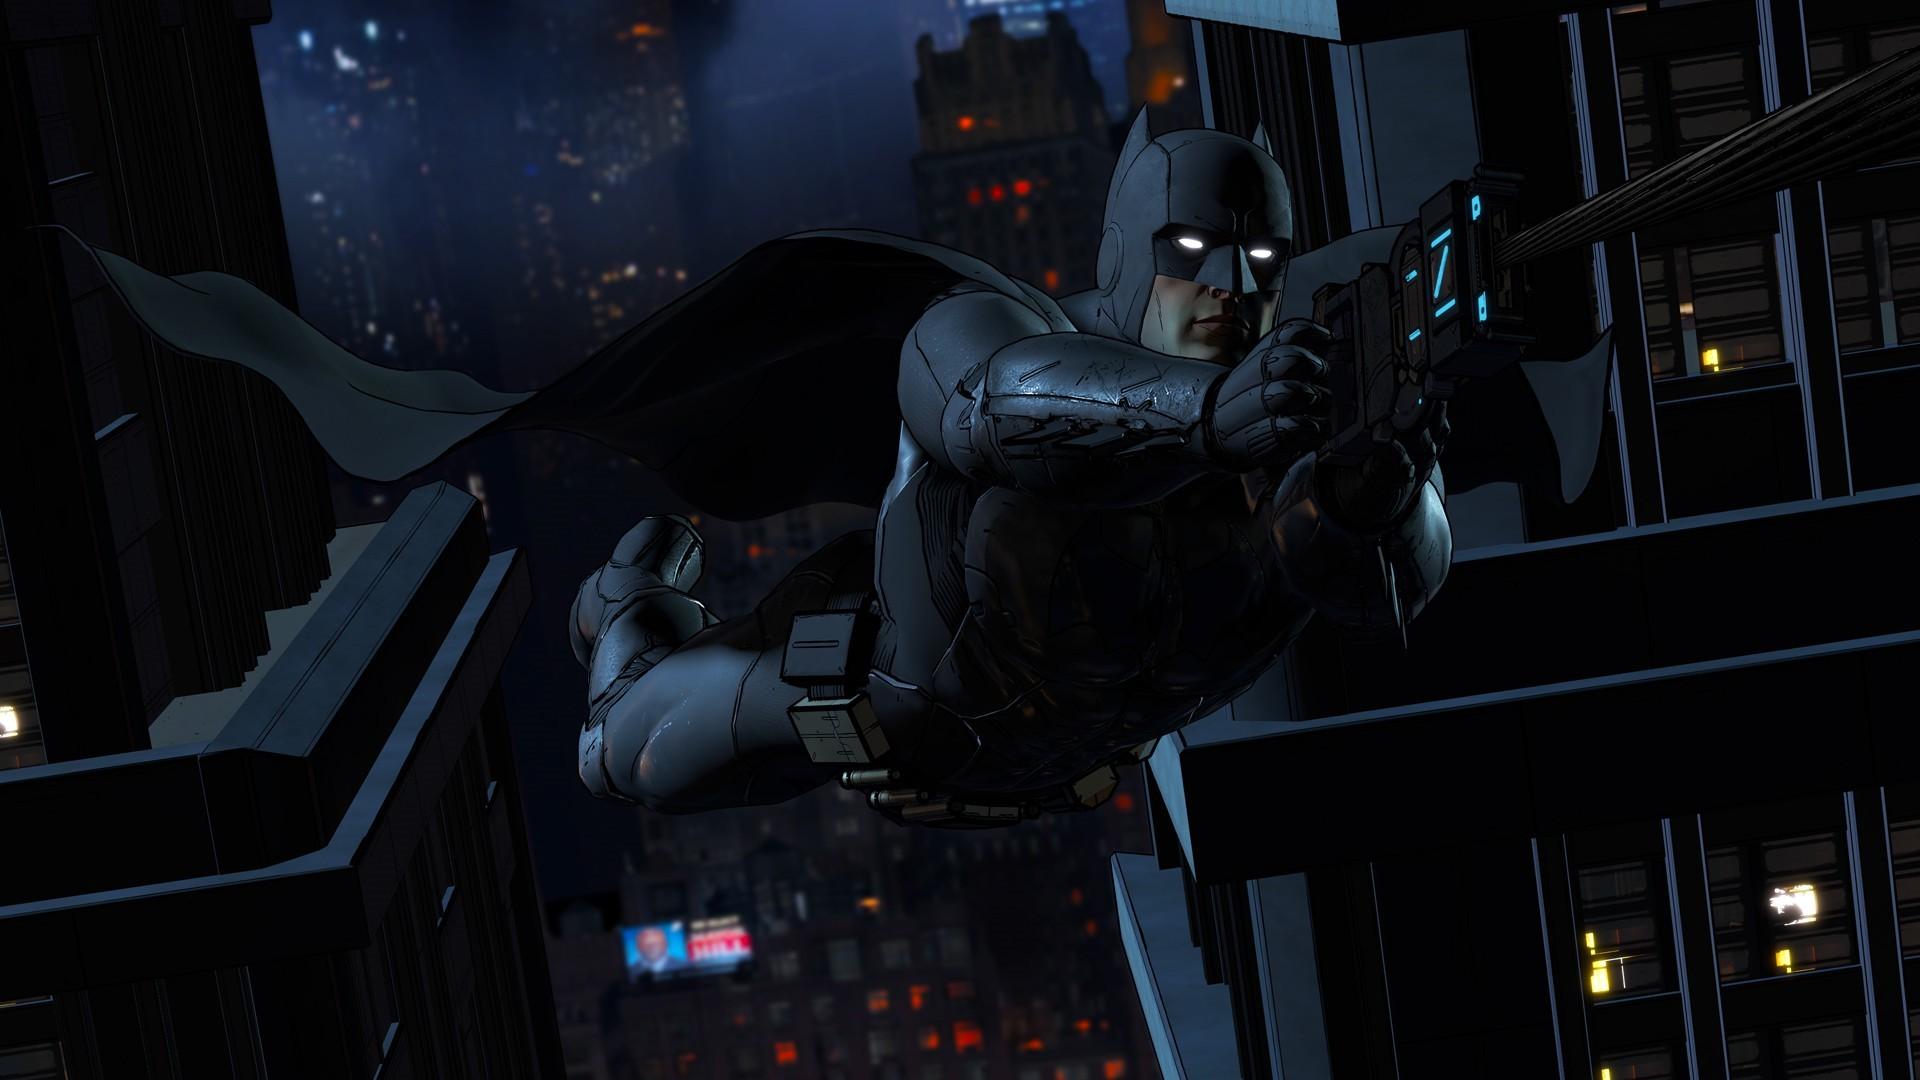 Telltale《蝙蝠侠》将会加入多人游戏